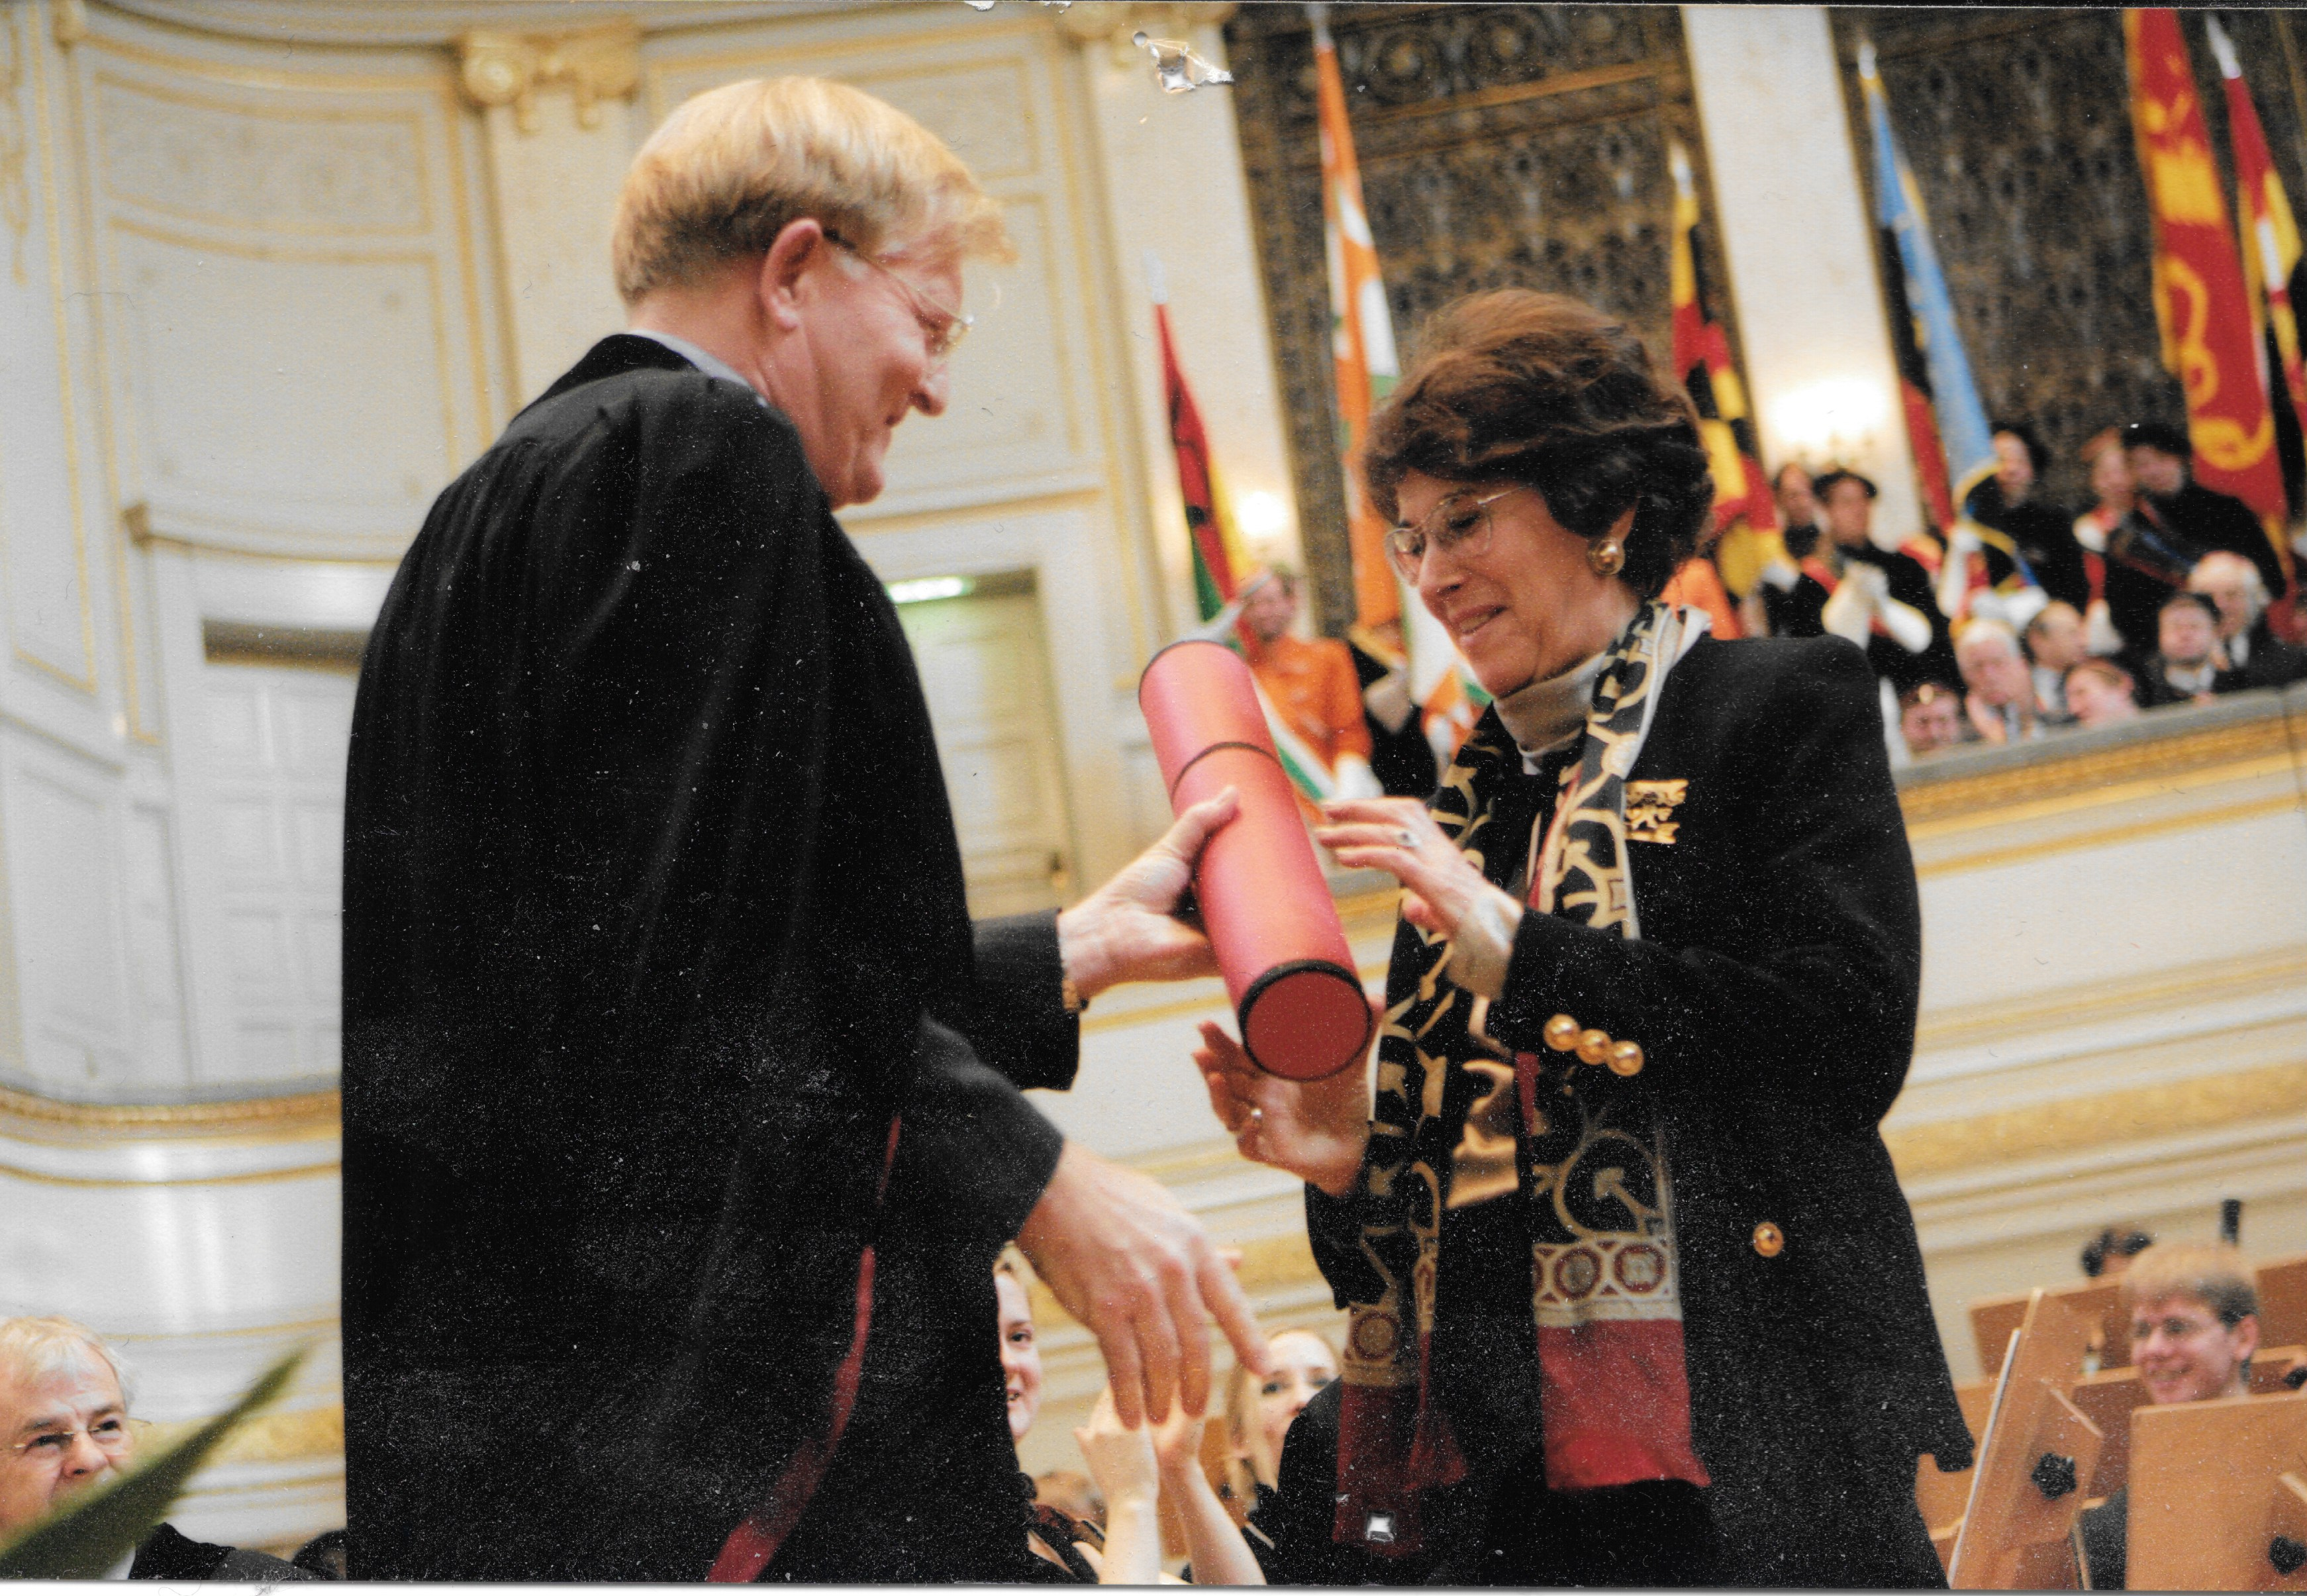 Receiving Honorary Doctorate